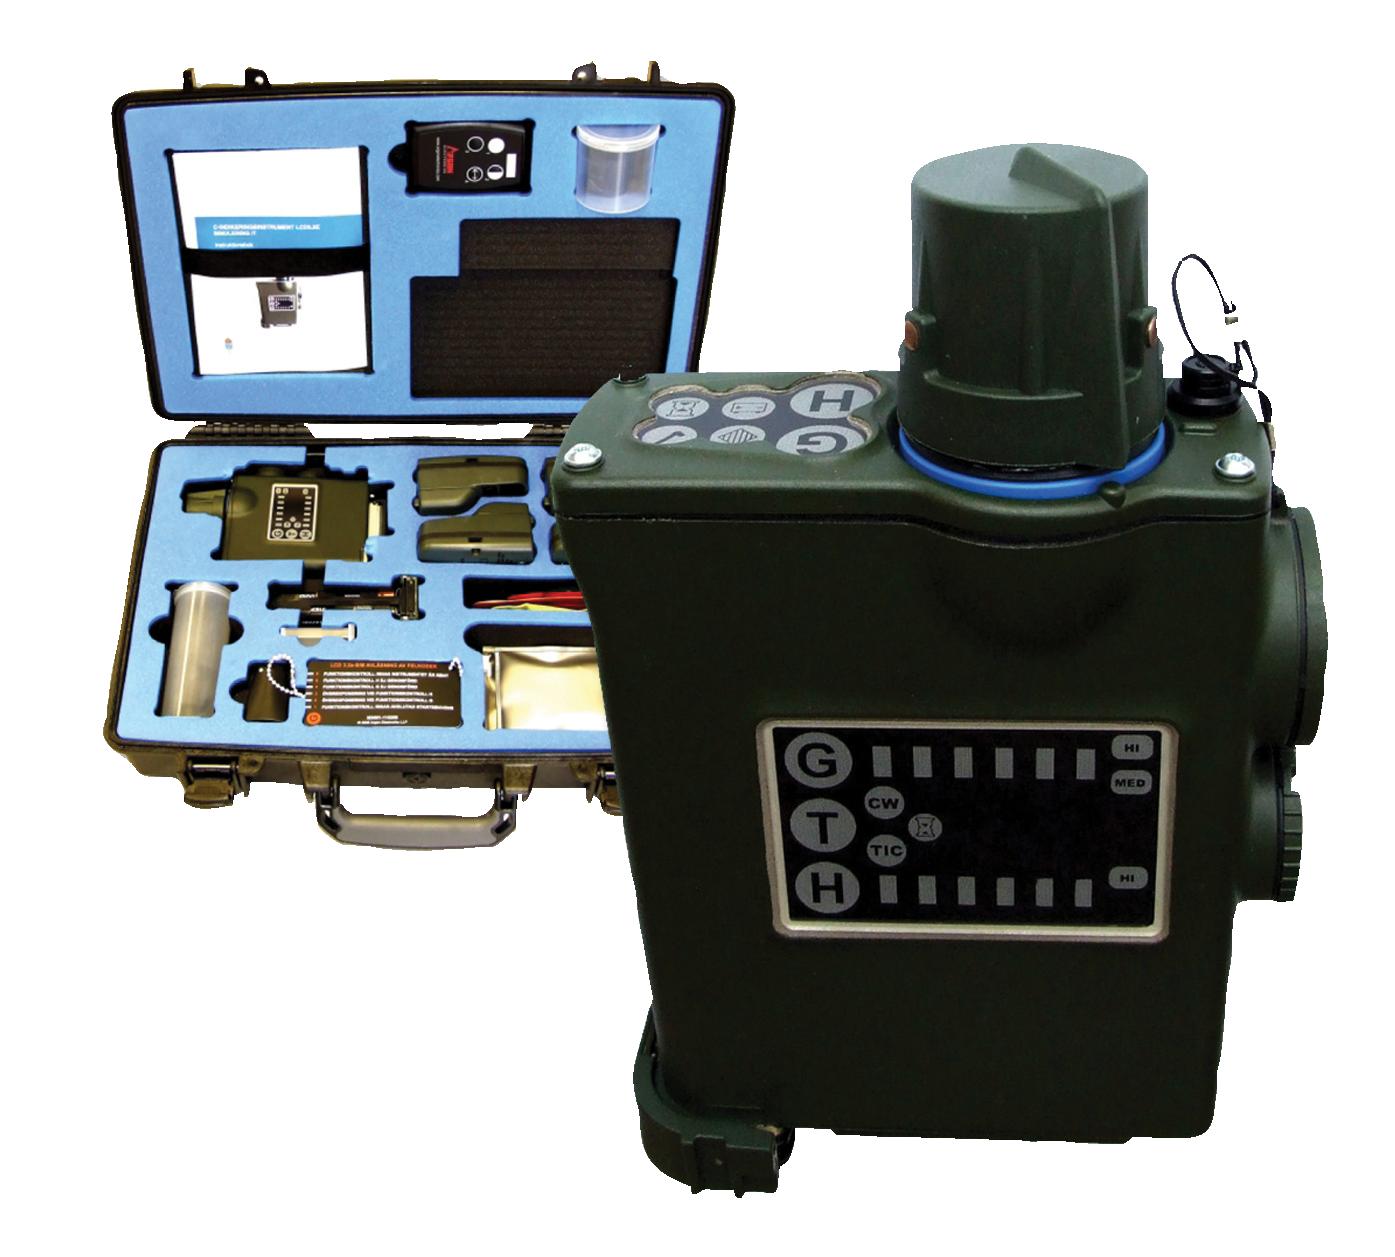 JCAD-M4 chemical hazard detection simulator